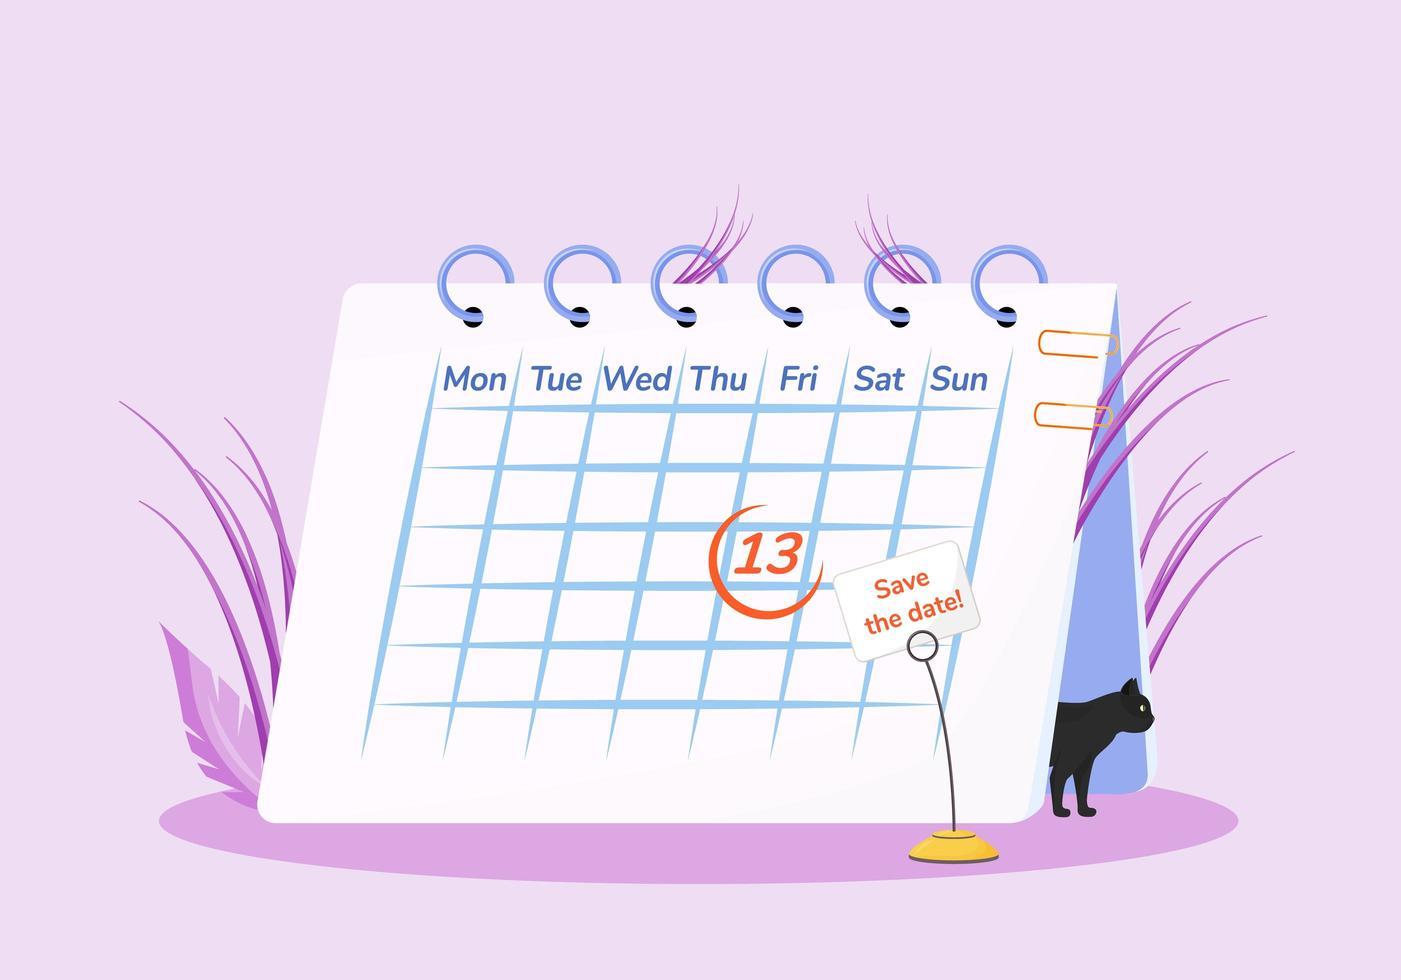 fredag 13 i kalendern vektor